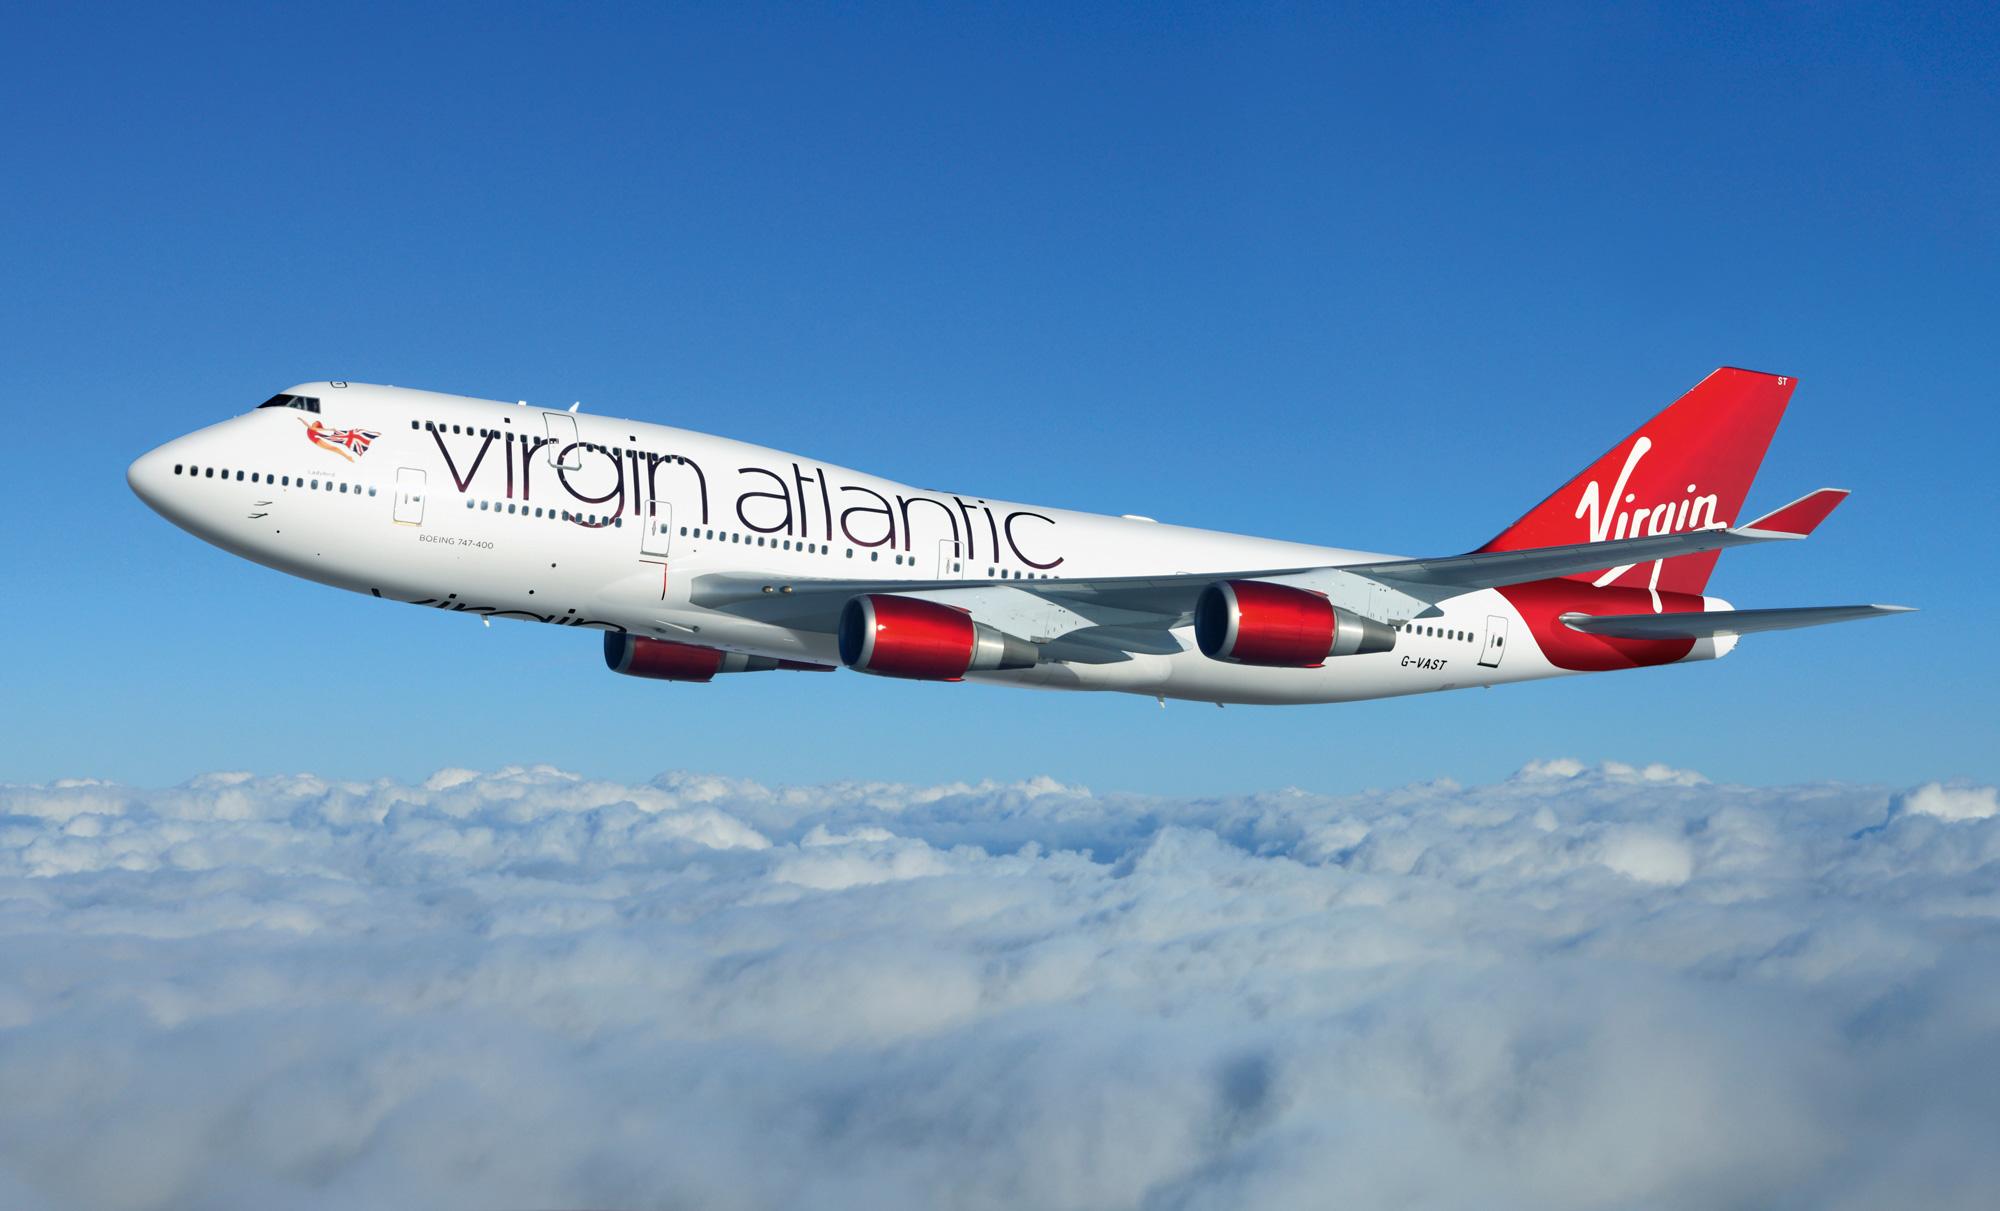 Virgin Atlantic's next generation Airbus is now on sale